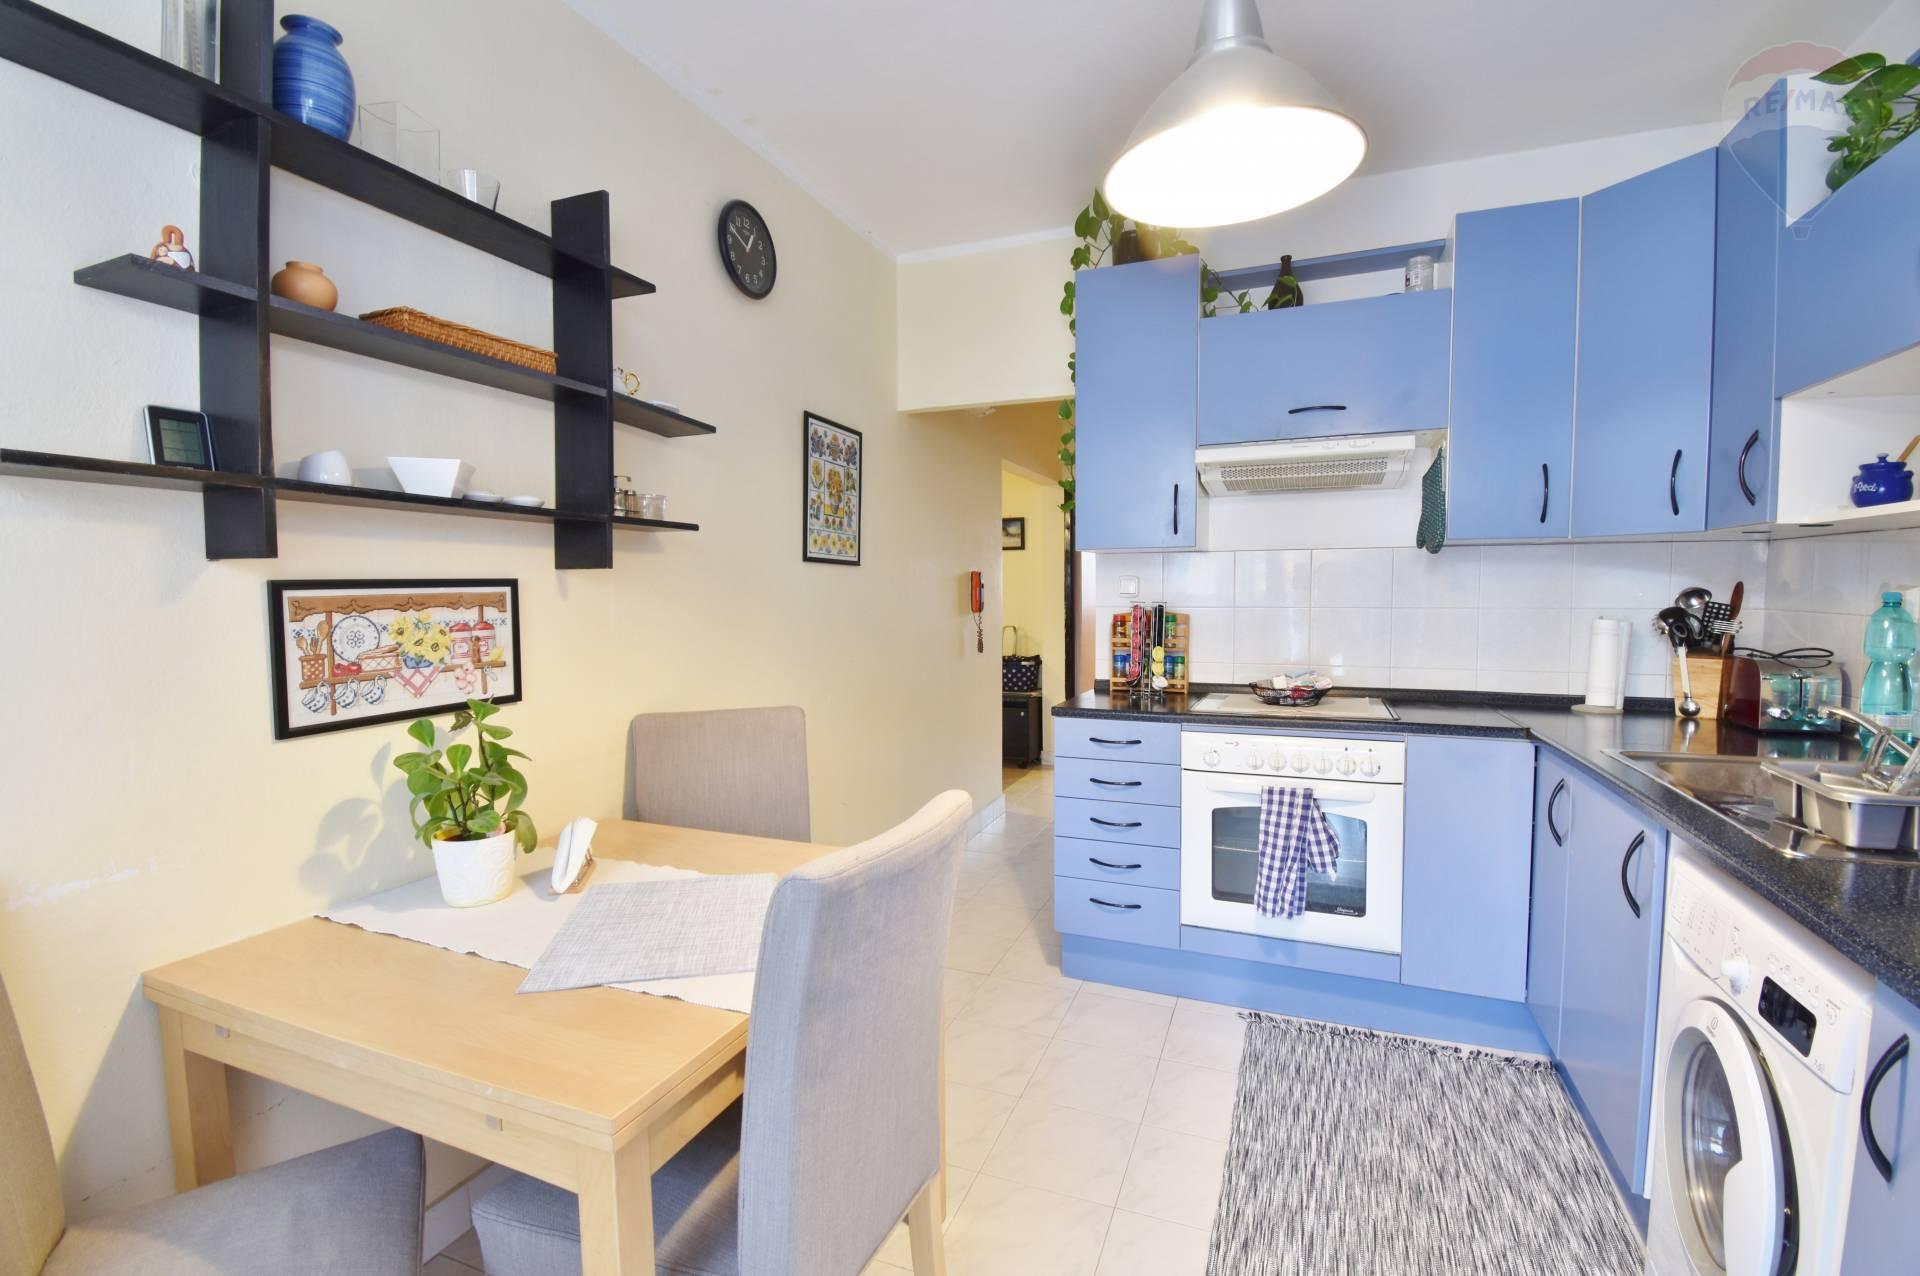 Predaj 4 izbový byt, 90 m2, Beniakova ulica, Bratislava - Karlova Ves, Loggia